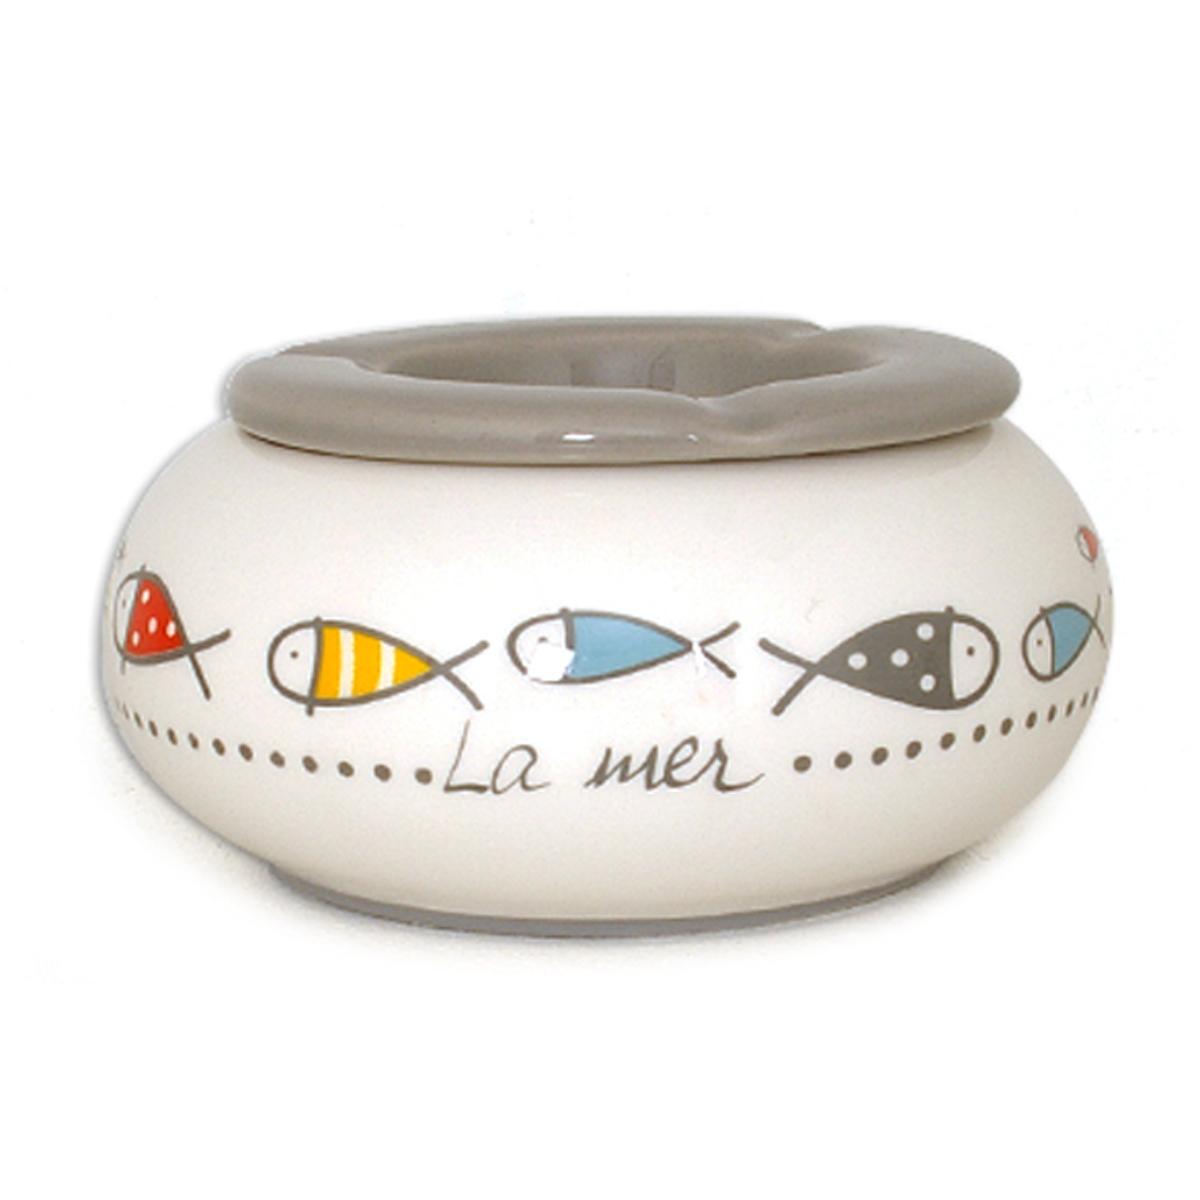 Cendrier marocain céramique \'Poissons - La Mer\' multicolore - 15x8 cm - [A1130]